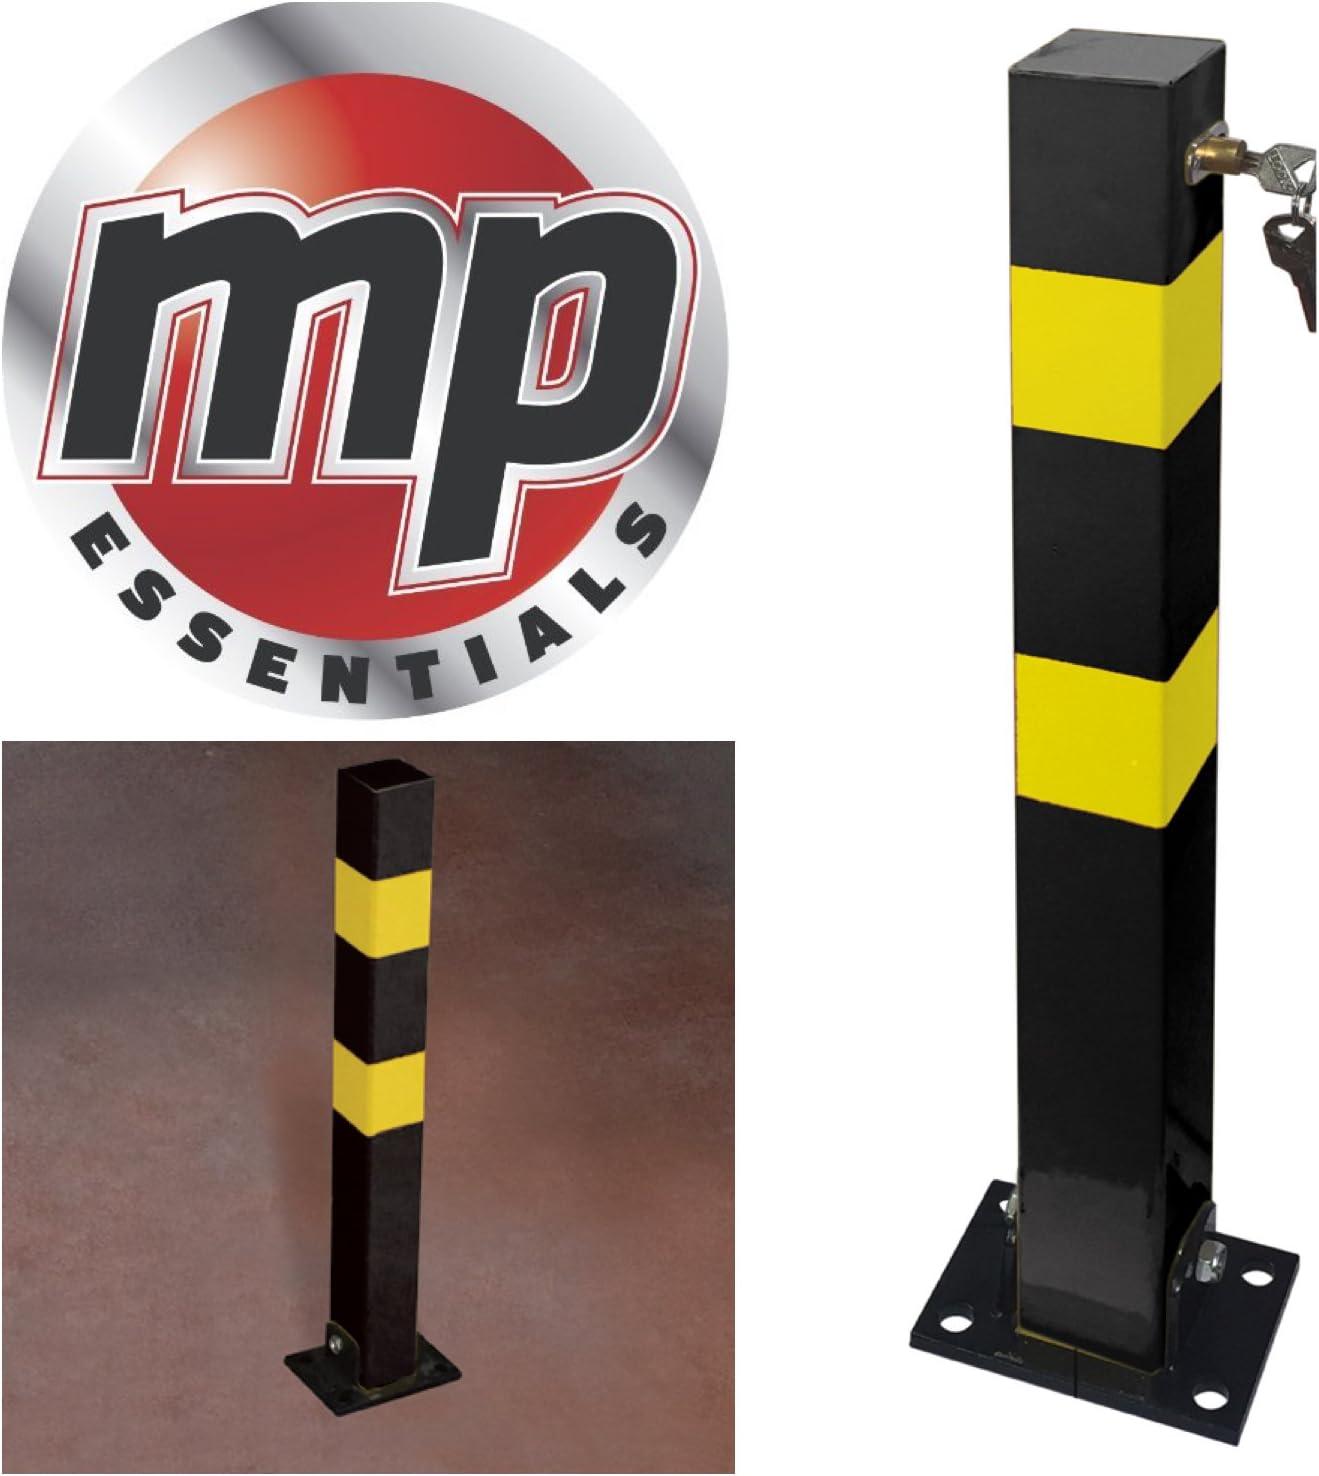 2 Heavy Duty Folding Robust Security Parking Post Driveway Bollard Lock /& Keys